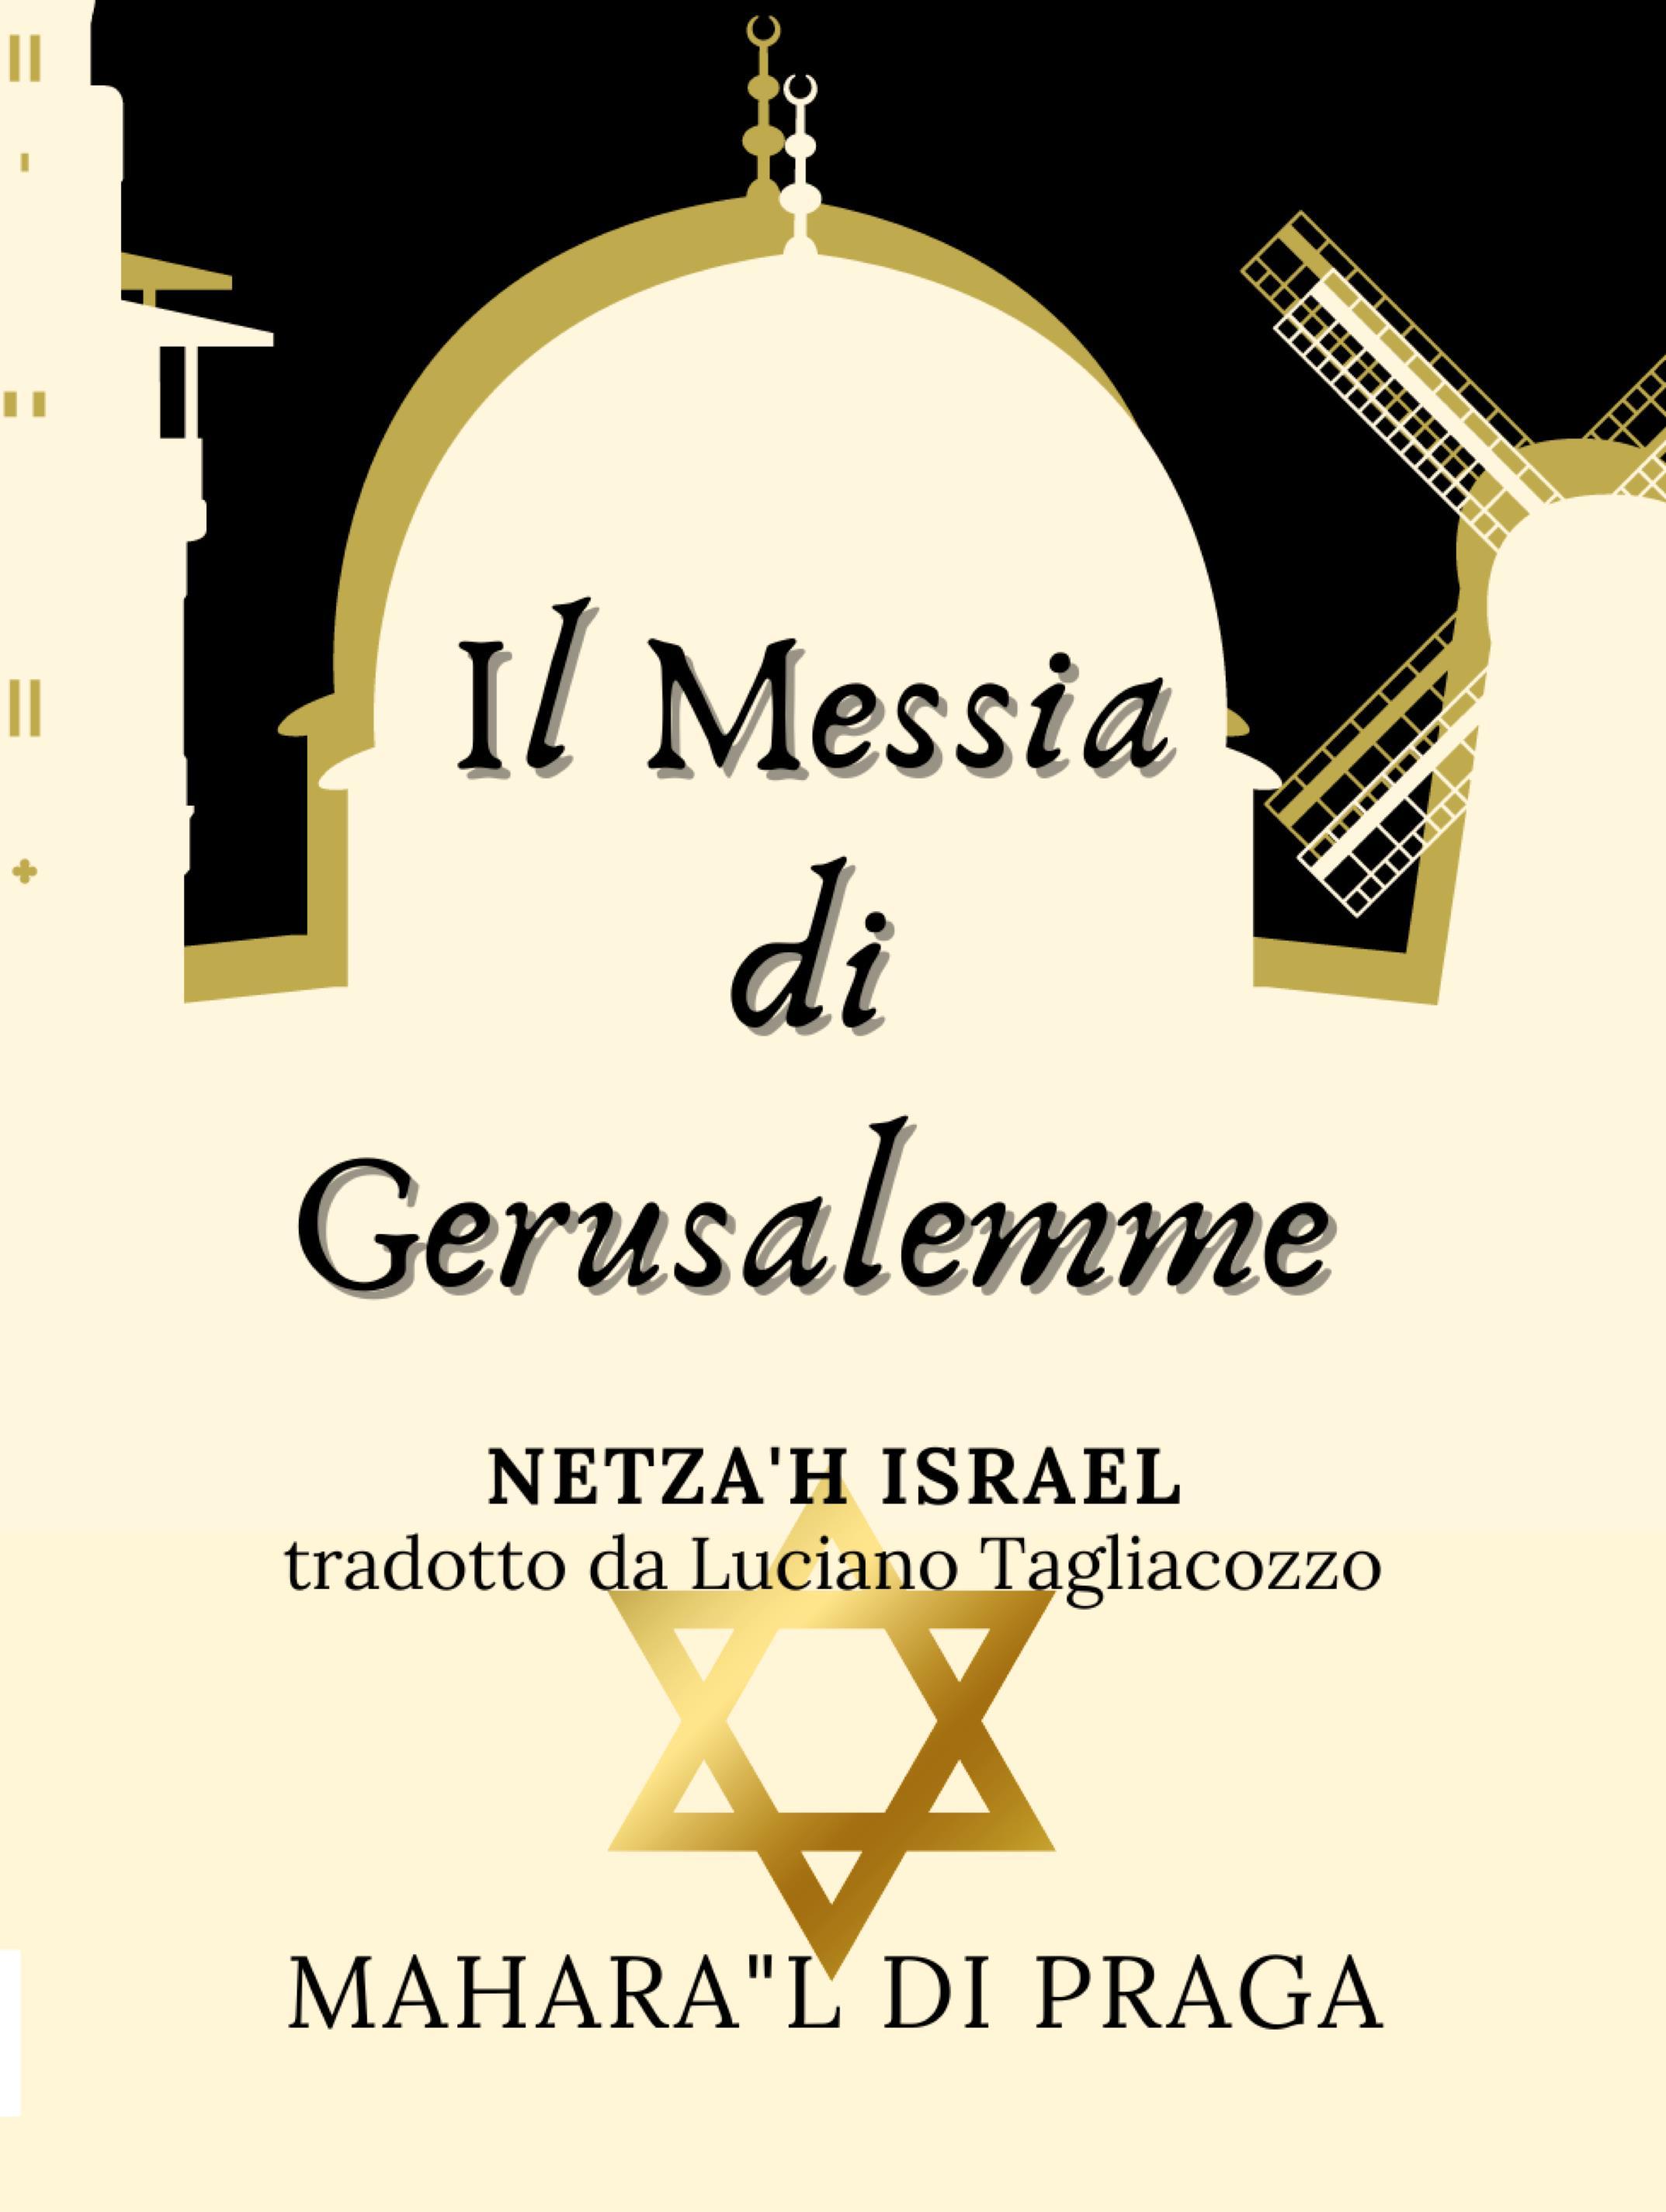 Il Messia di Gerusalemme